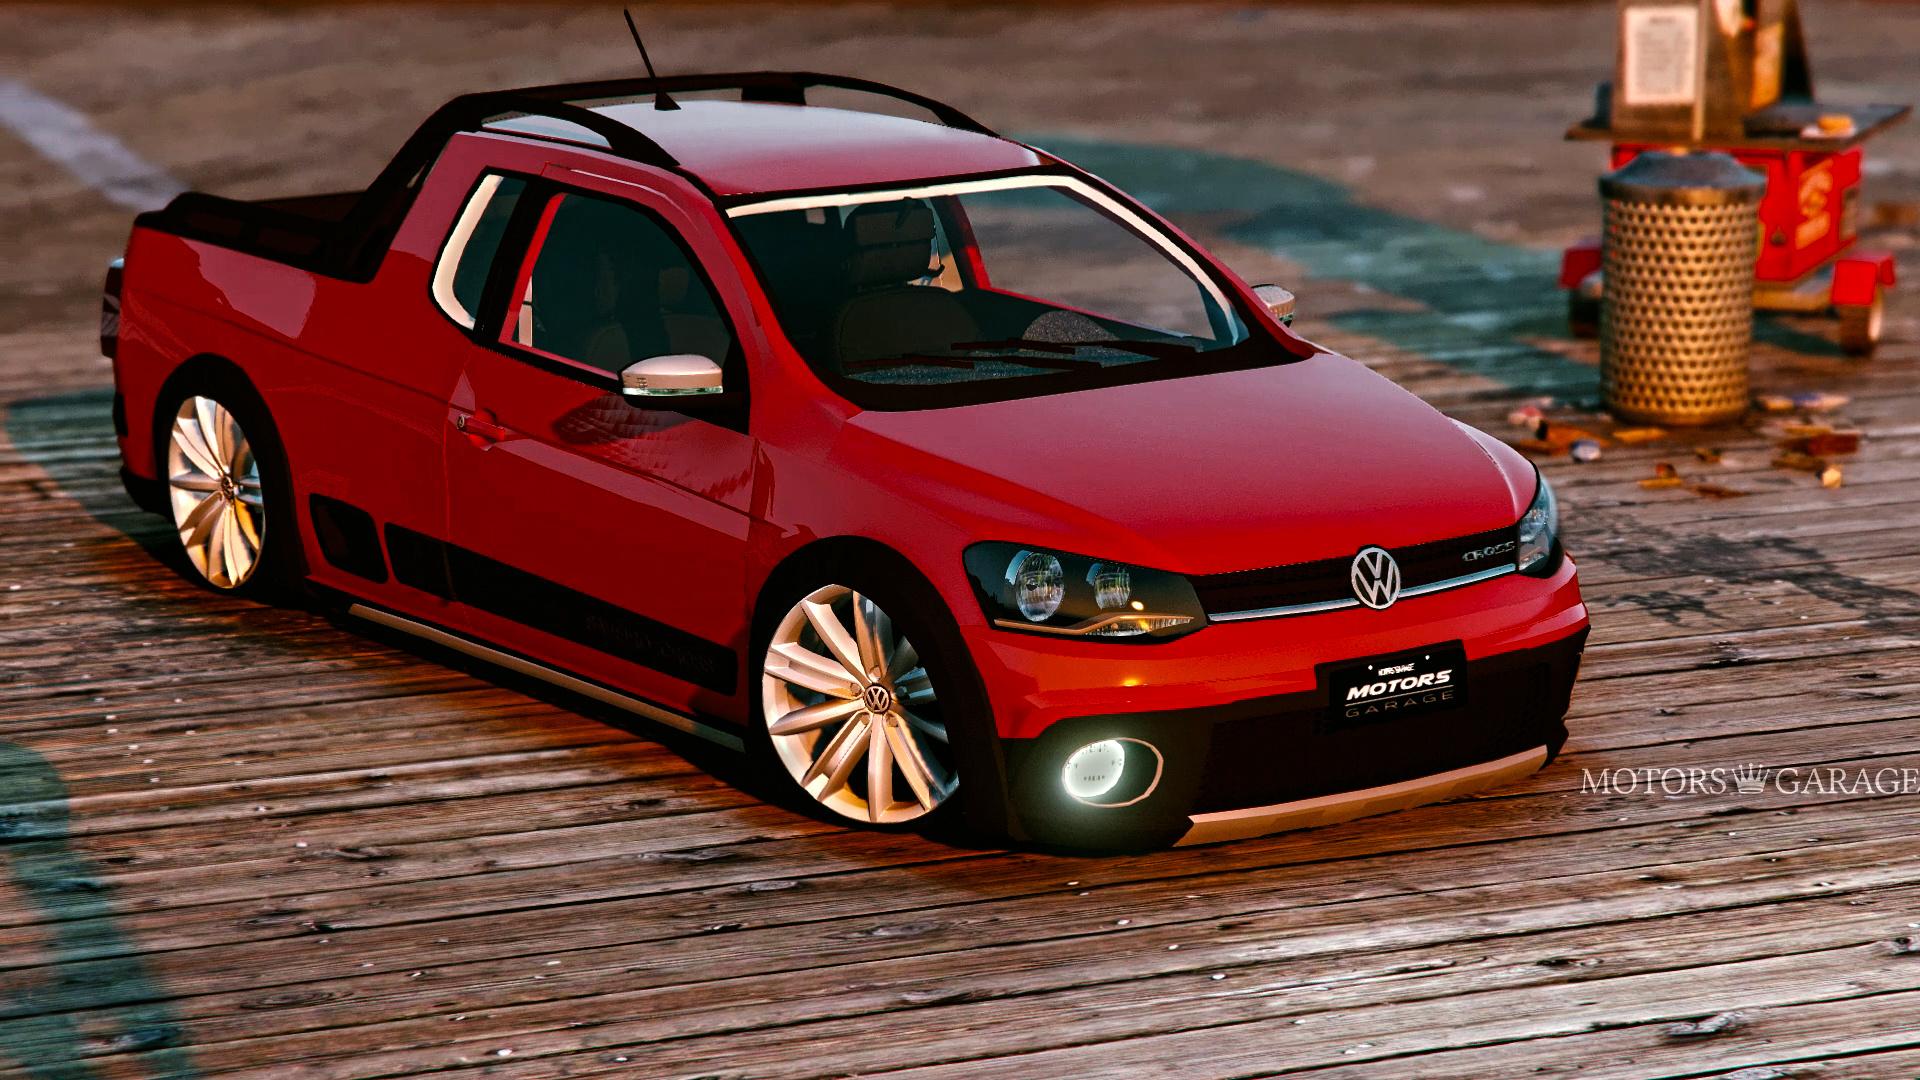 Gta San Andreas Wallpaper Hd Volkswagen Saveiro G6 Cross Gta5 Mods Com